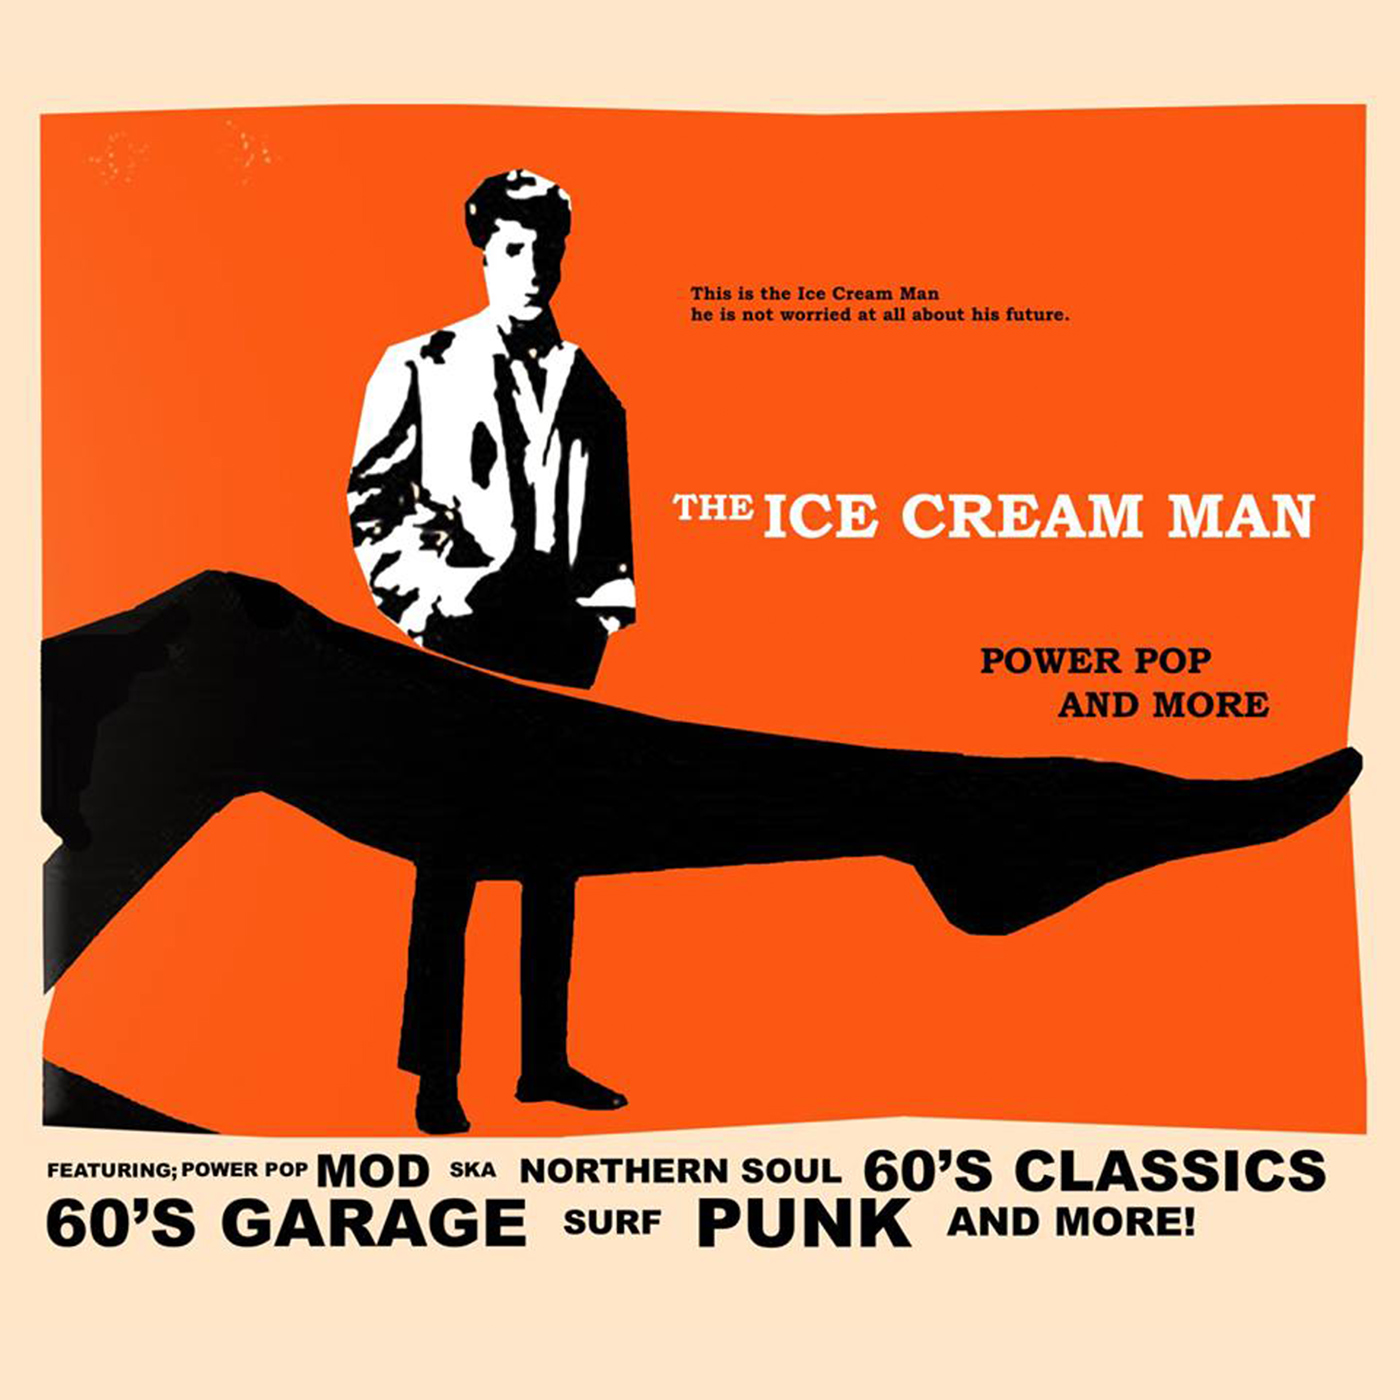 Ice Cream Man Power Pop And More #310 – Bombshell Radio